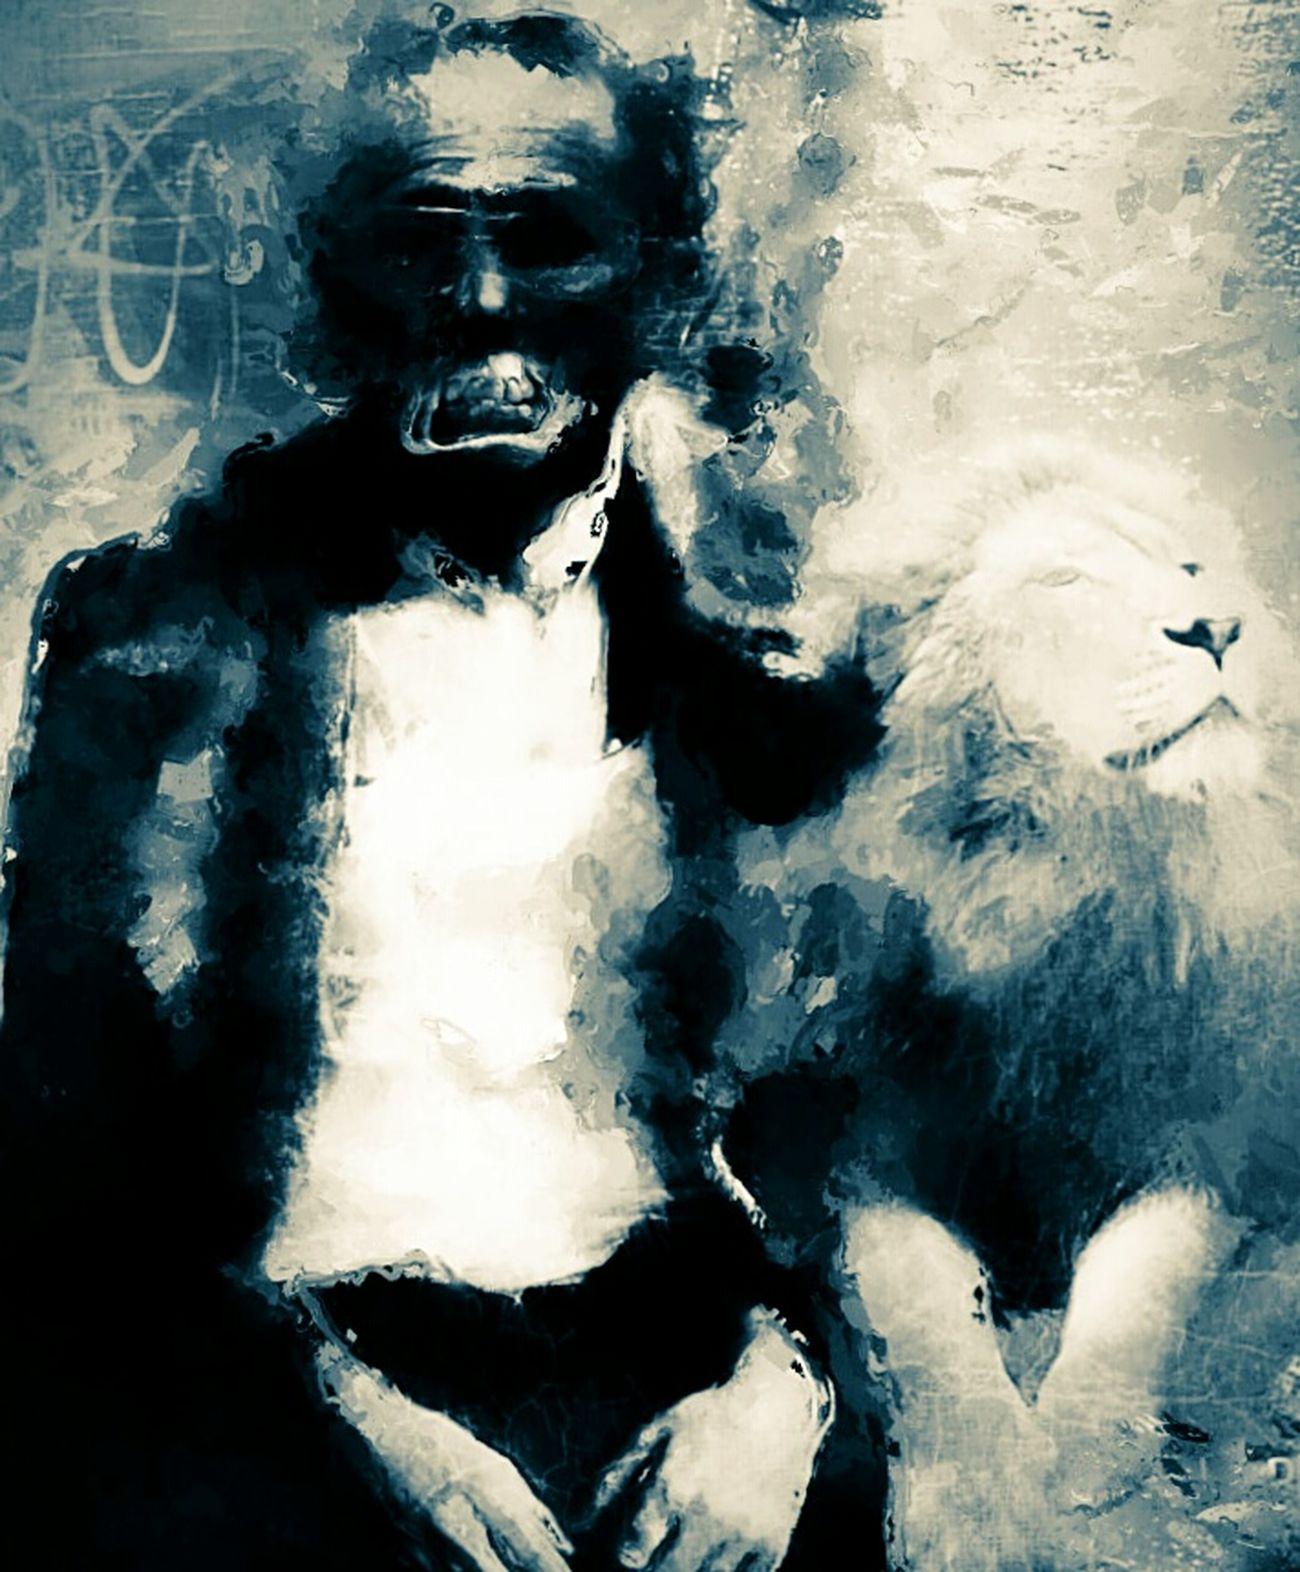 Regulus Variation Animal Themes Sad Heart Portrait Outdoors Trou De La Lune : FreestyleAxis of evilRegulus Opinions : England USA He Is The Goal Propriété Torch All